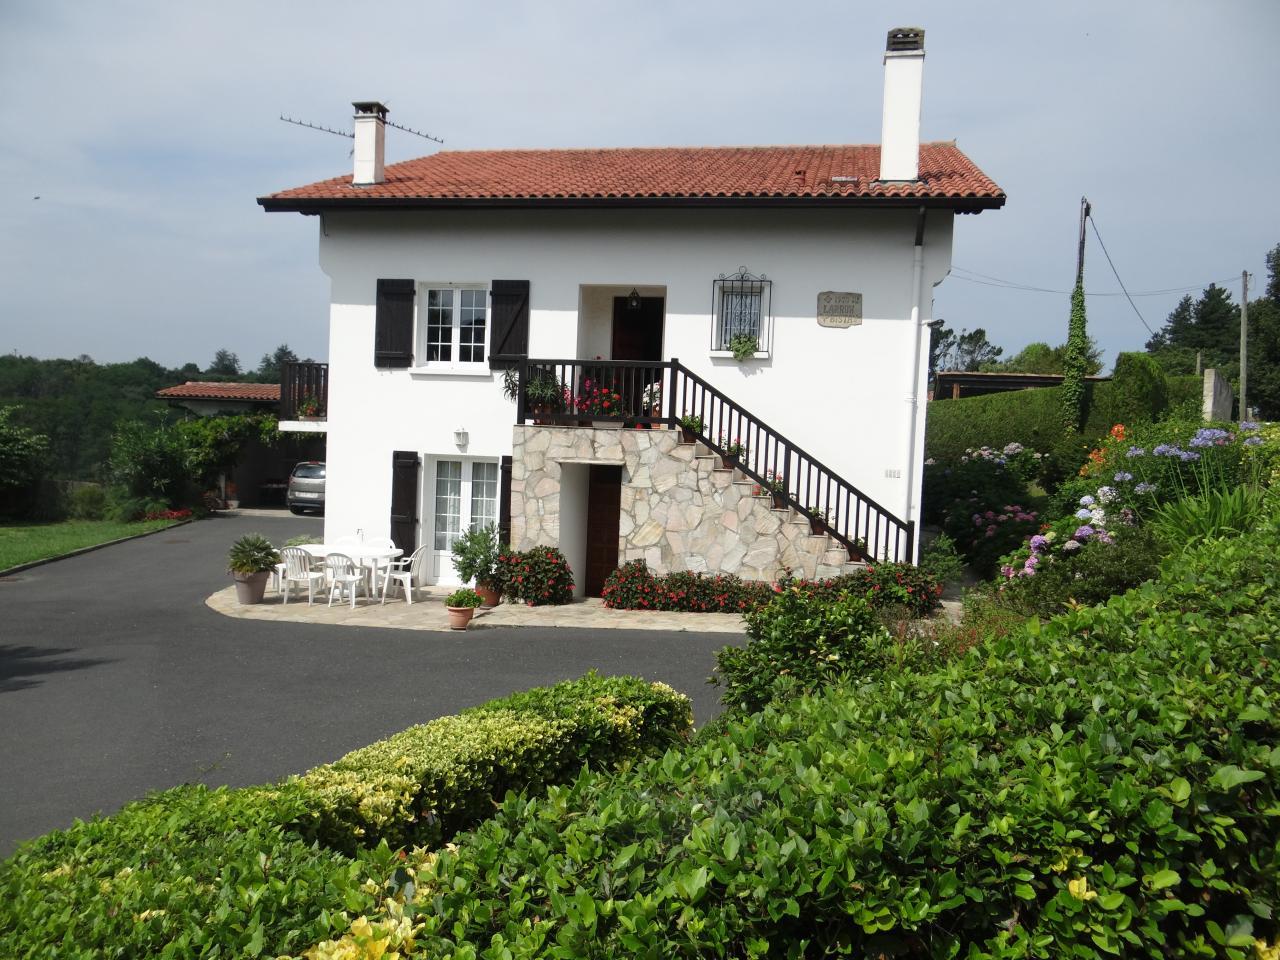 Location maison vacances pays basque espagnol ventana blog for Location villa de vacances